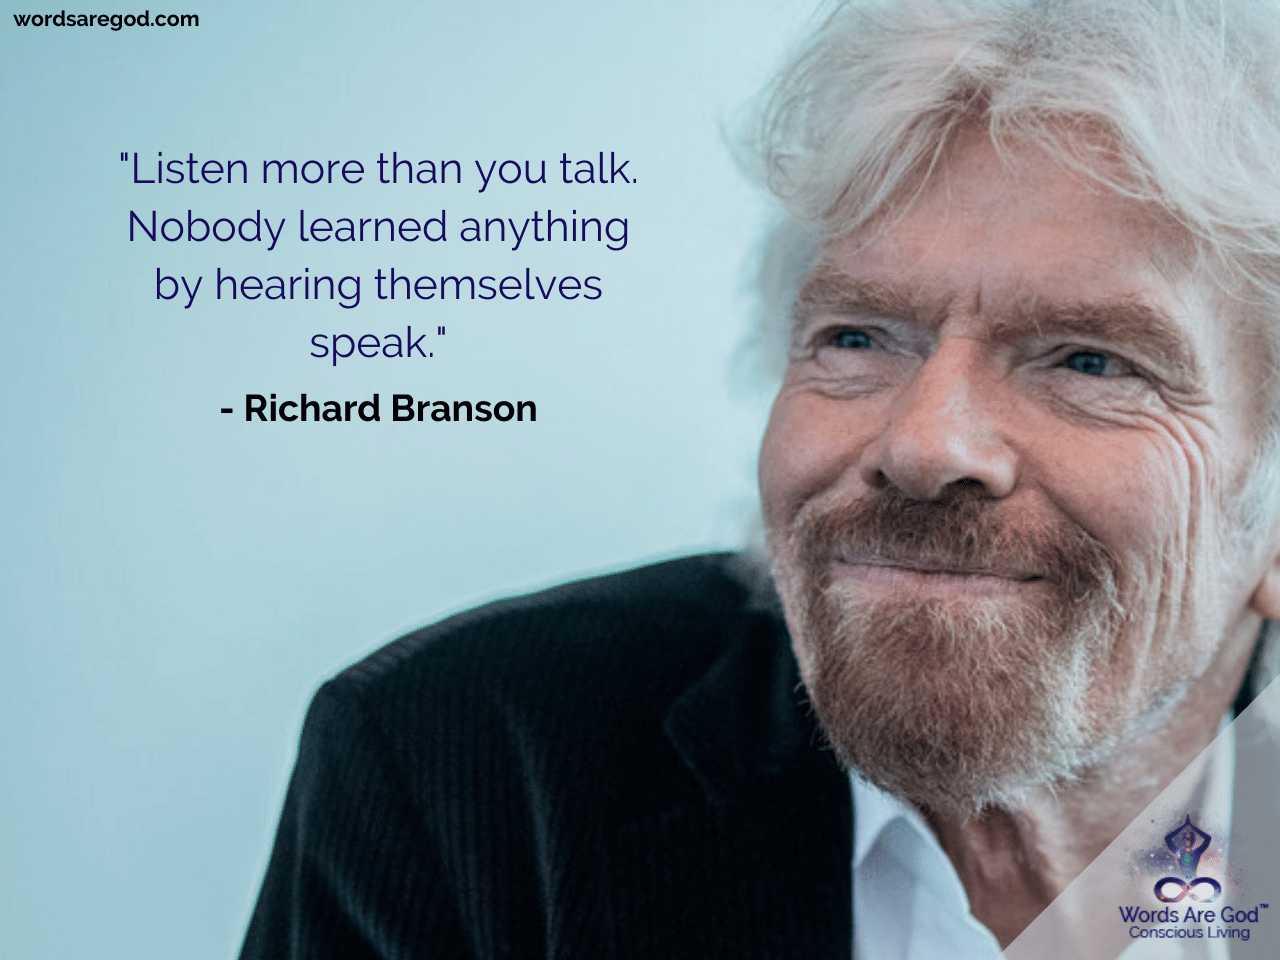 Richard Branson Inspirational Quote by Richard Branson